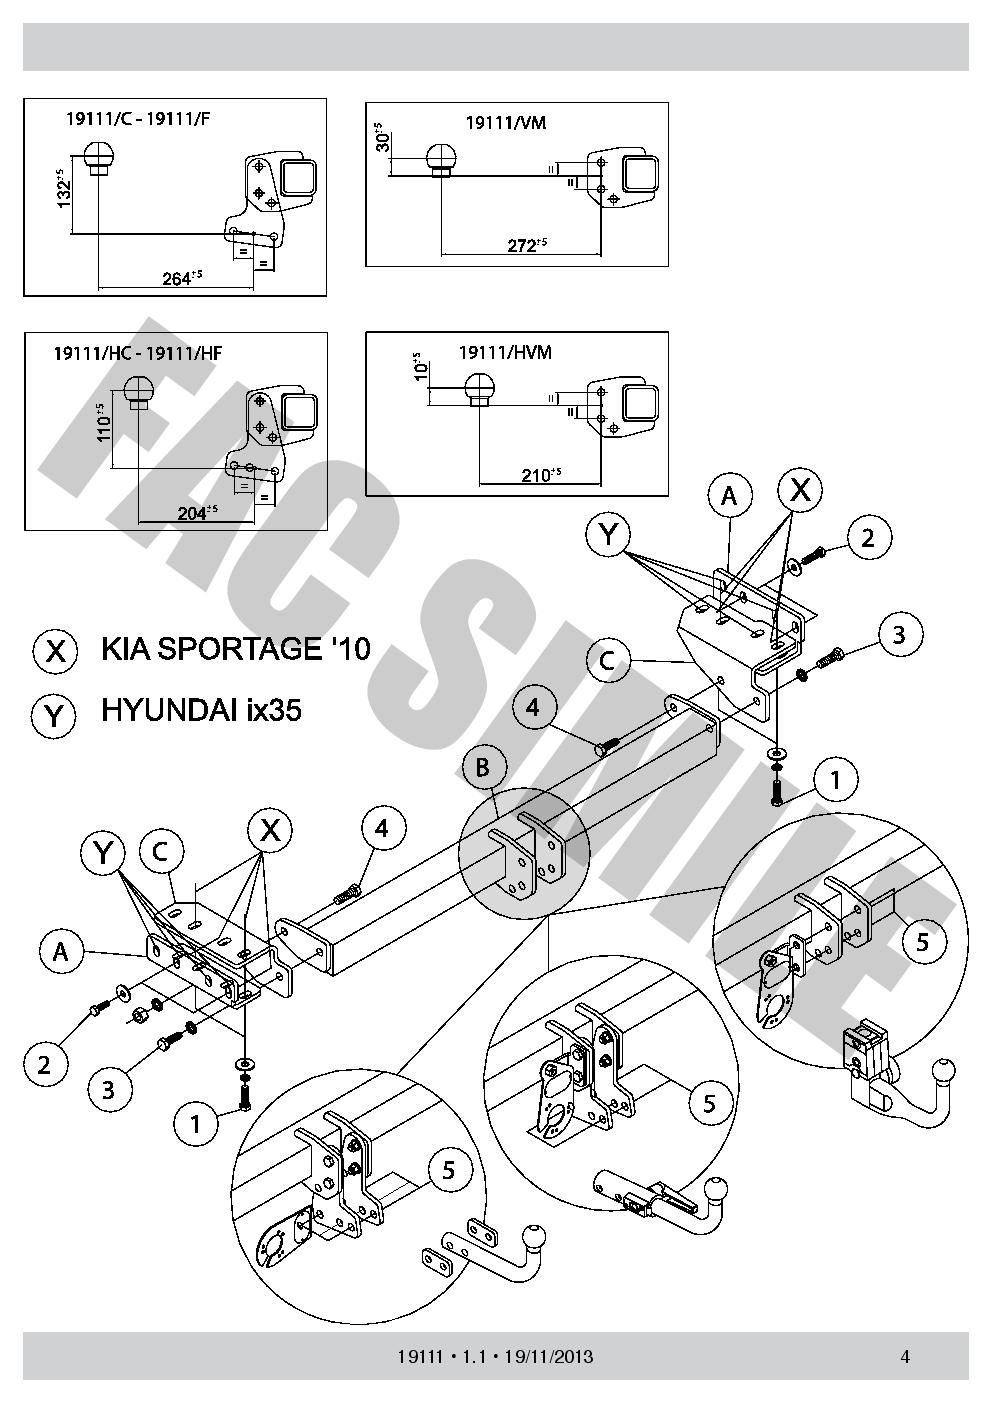 Towbar Detachable 13 pin kit C2 for Kia Sportage 4Wd 2010-2016 19111//C/_A5